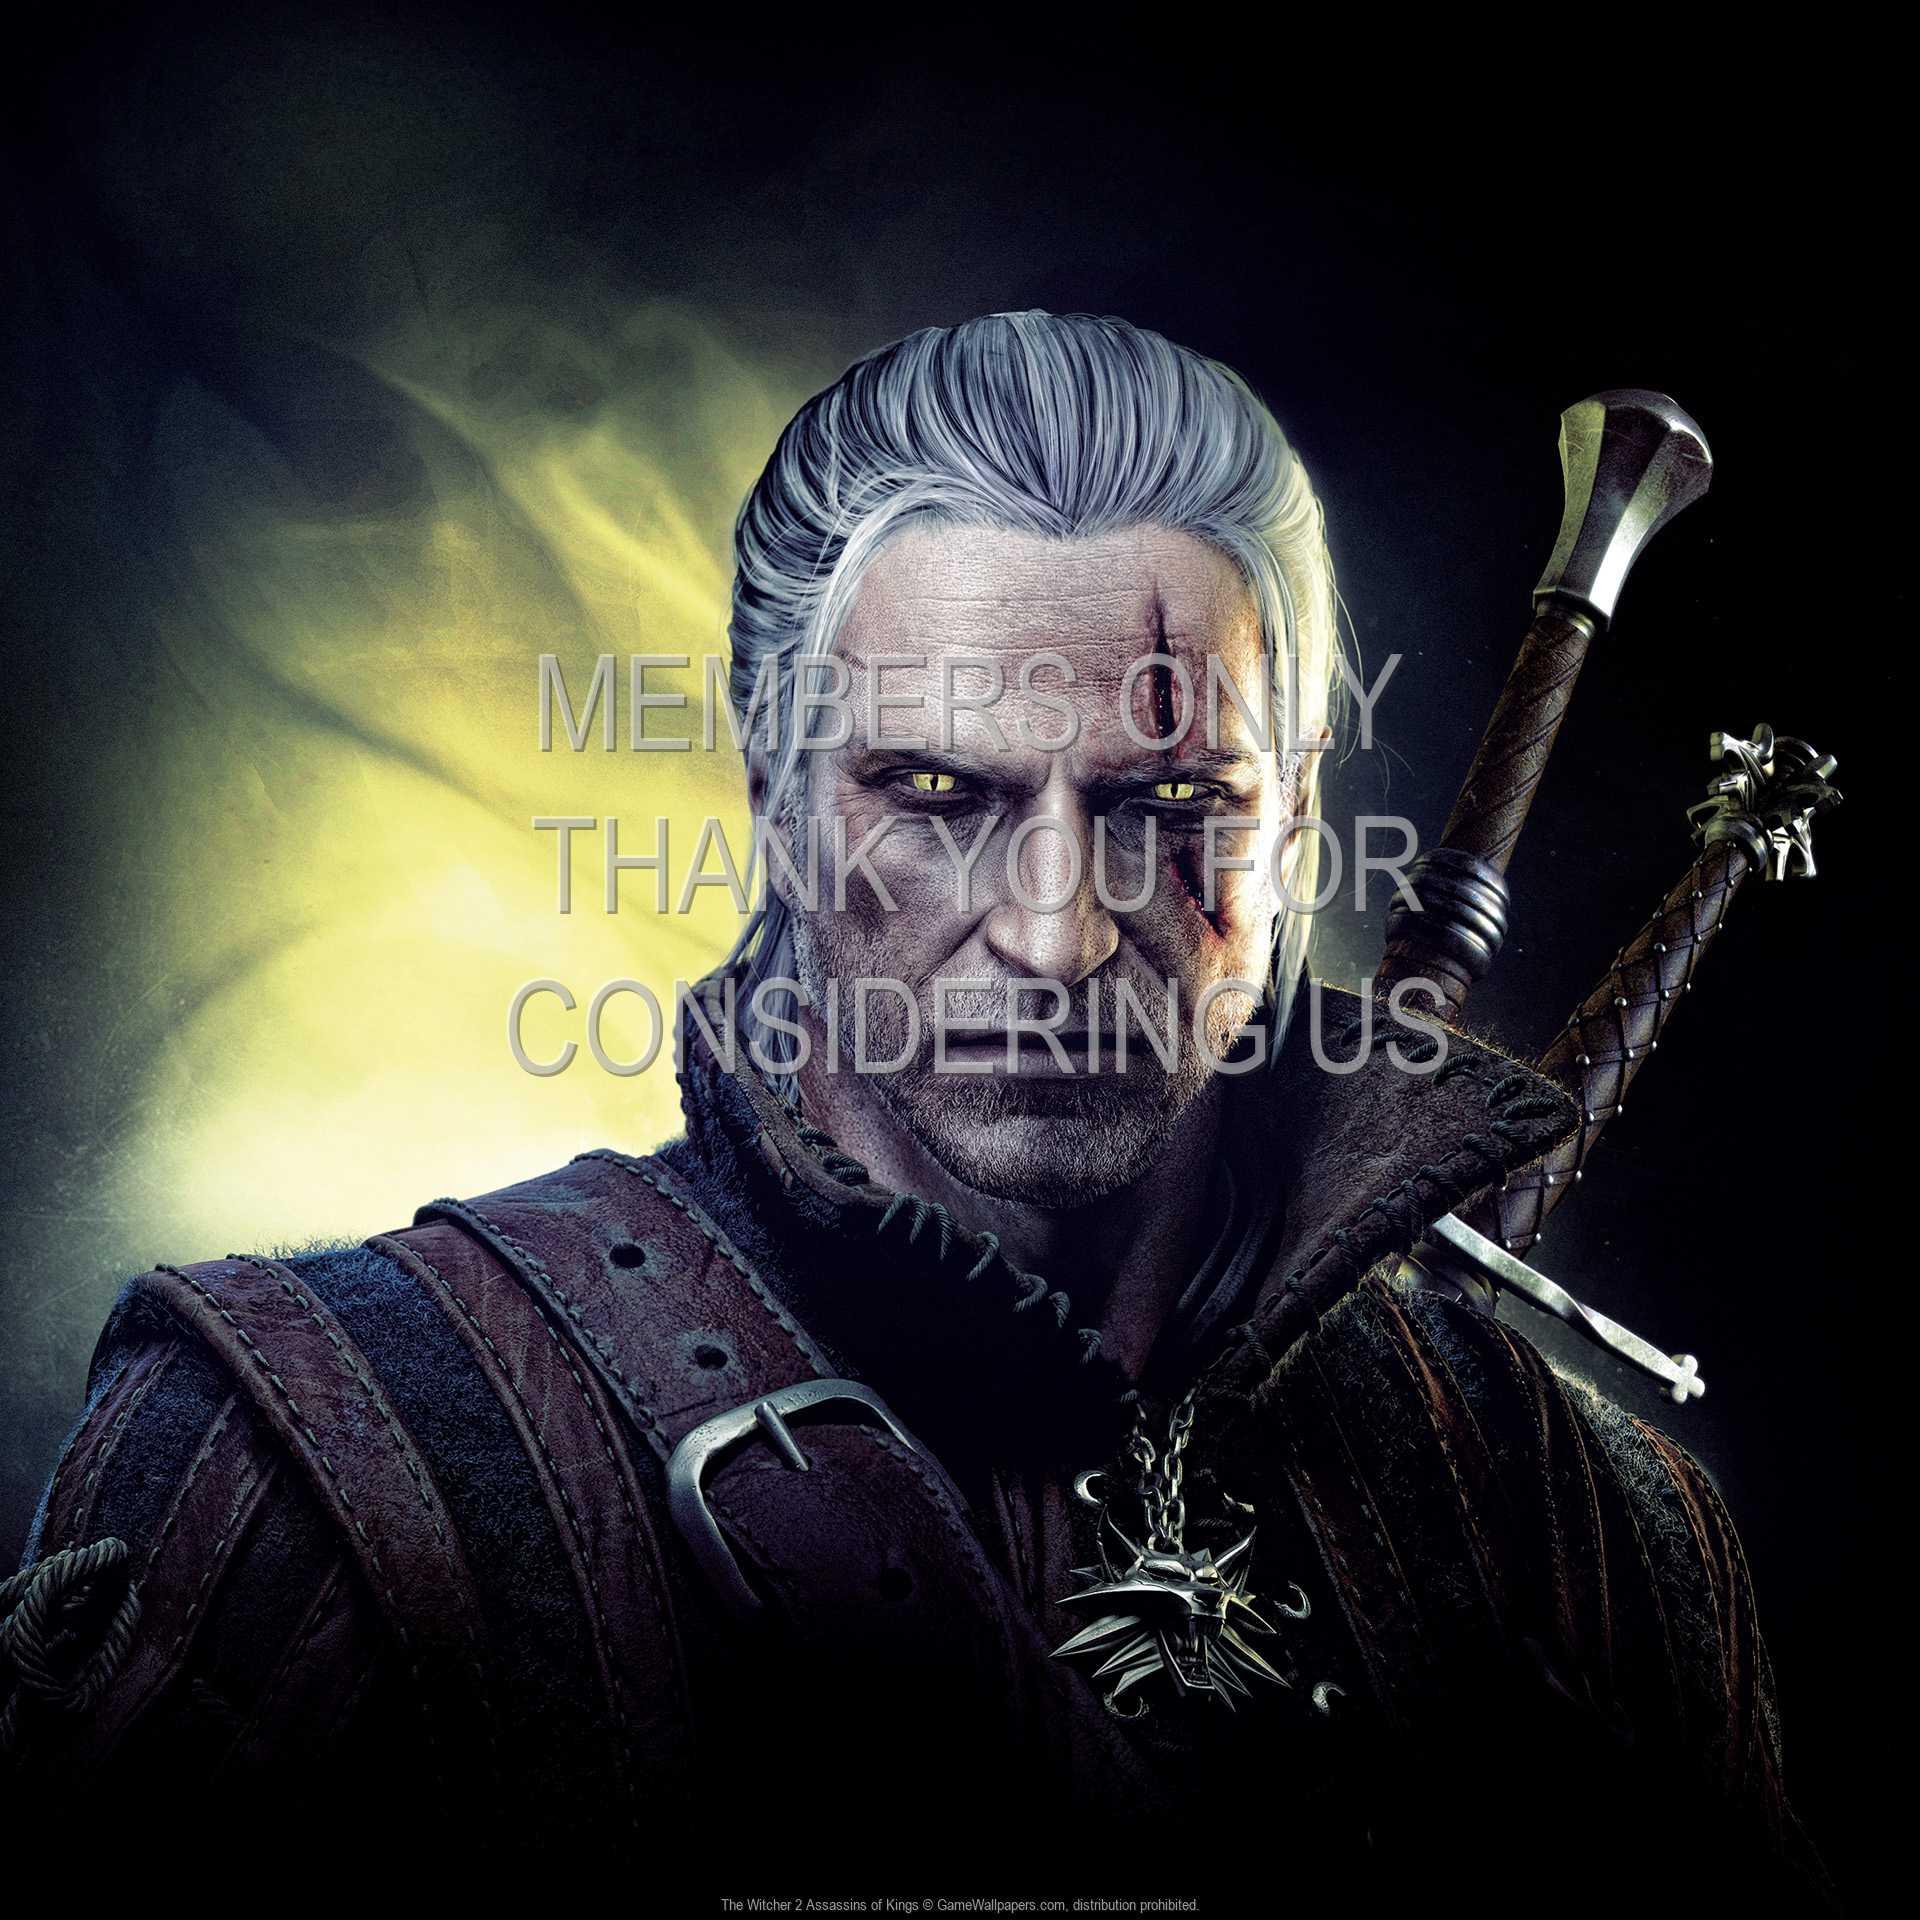 The Witcher 2: Assassins of Kings 1080p Horizontal Handy Hintergrundbild 09